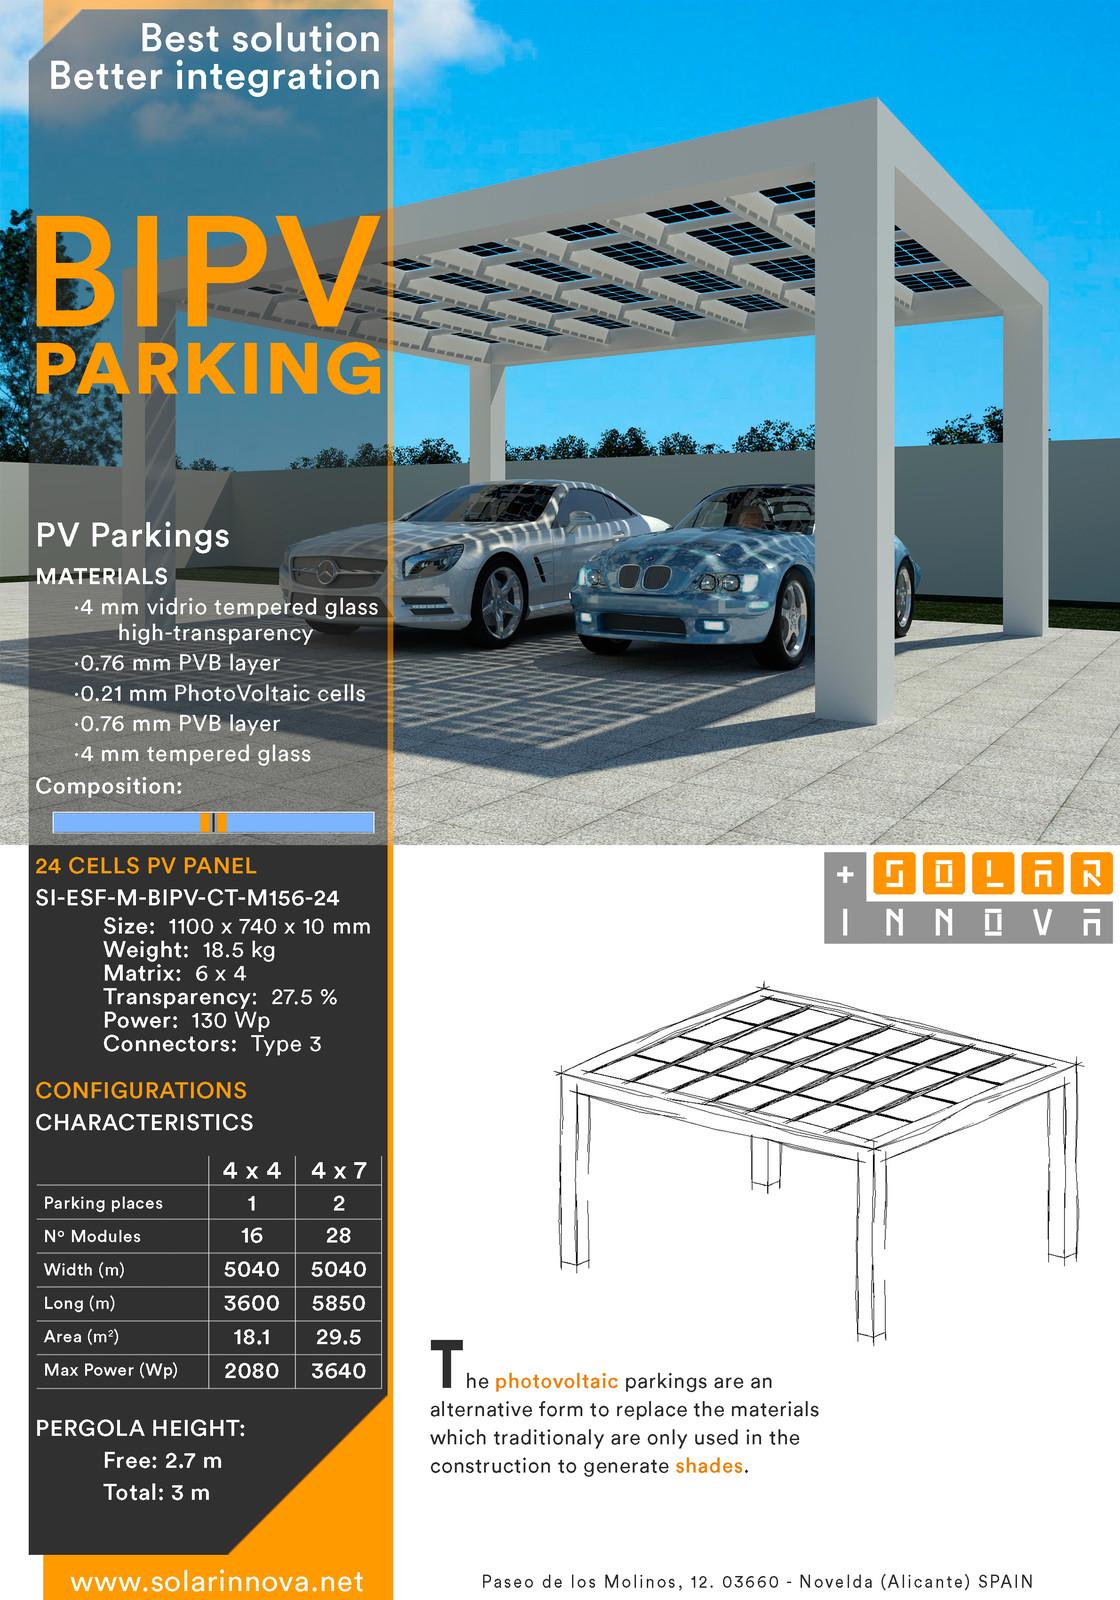 https://solarinnova.pl/wp-content/uploads/2021/04/katalog-2021-bipv-wiata-parking-en_Strona_1.com_.jpg